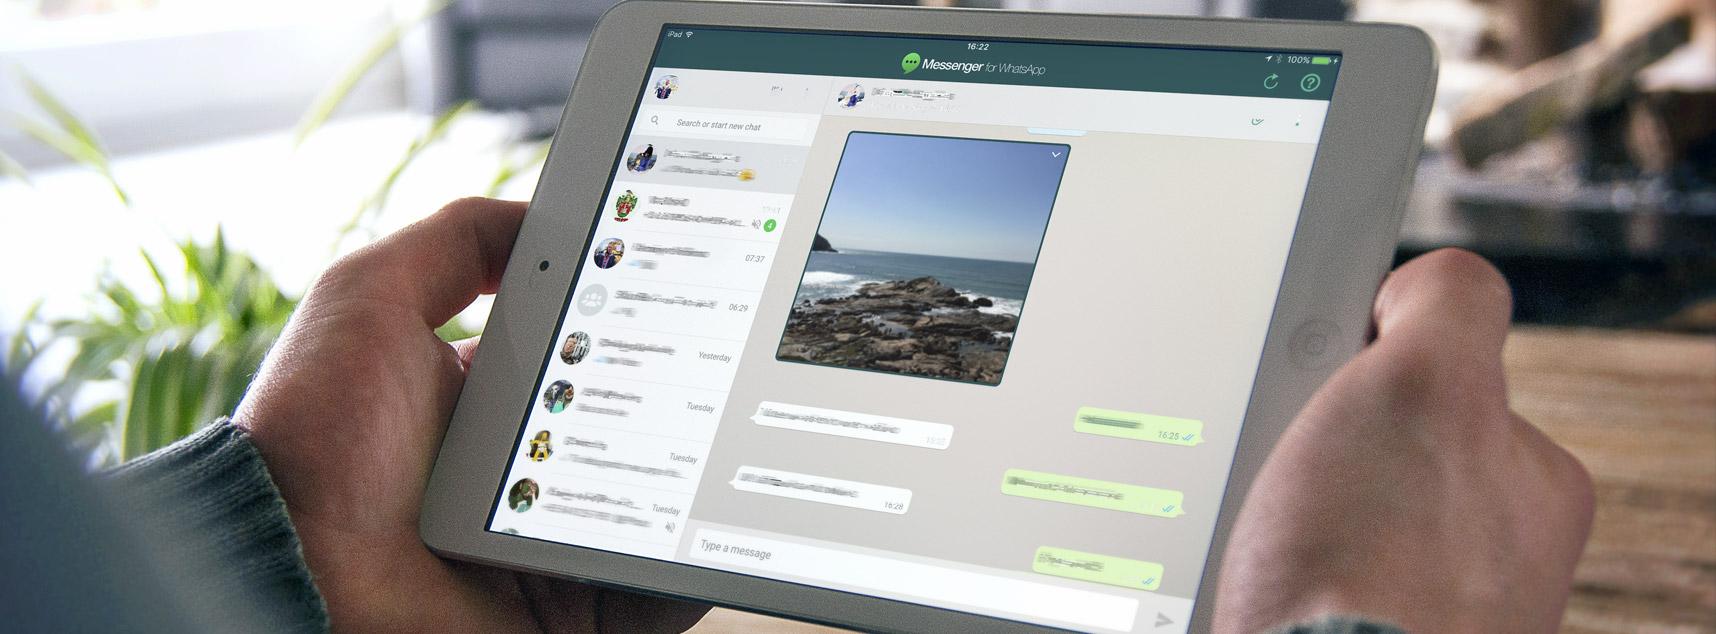 Messenger para WhatsApp